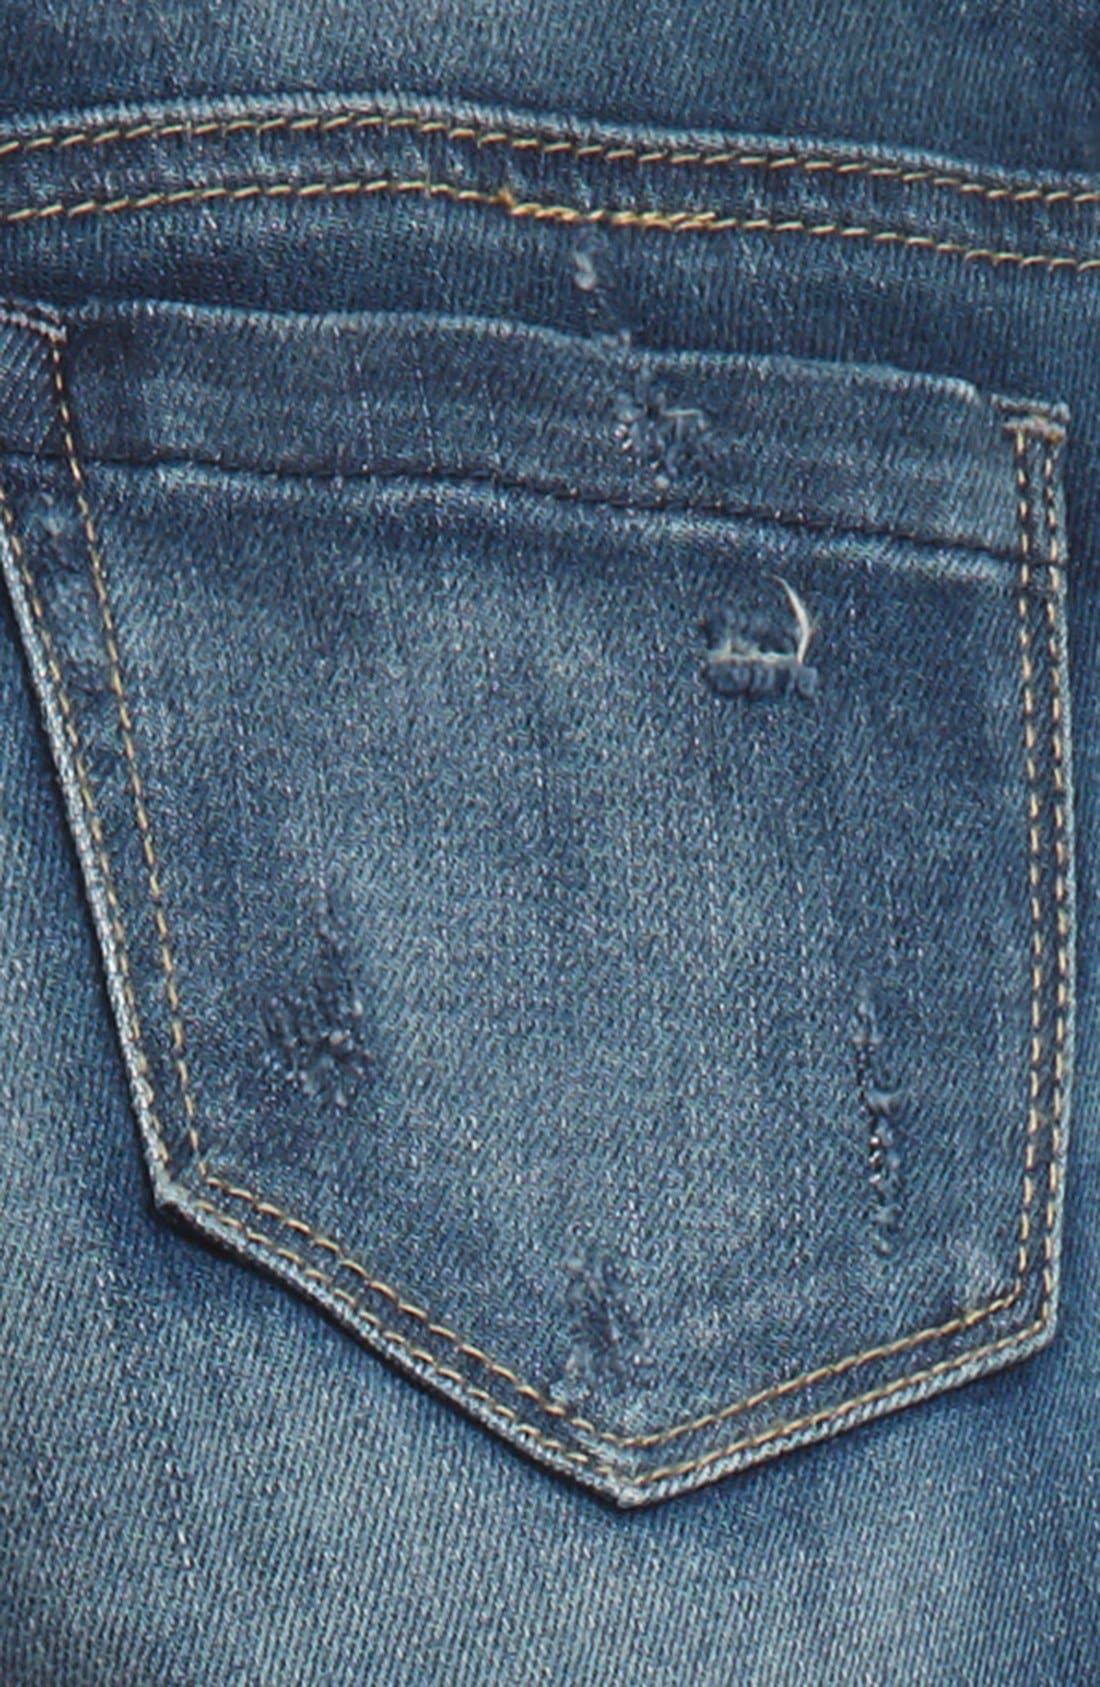 Alternate Image 3  - BLANKNYC Destroyed Boyfriend Jeans (Big Girls)